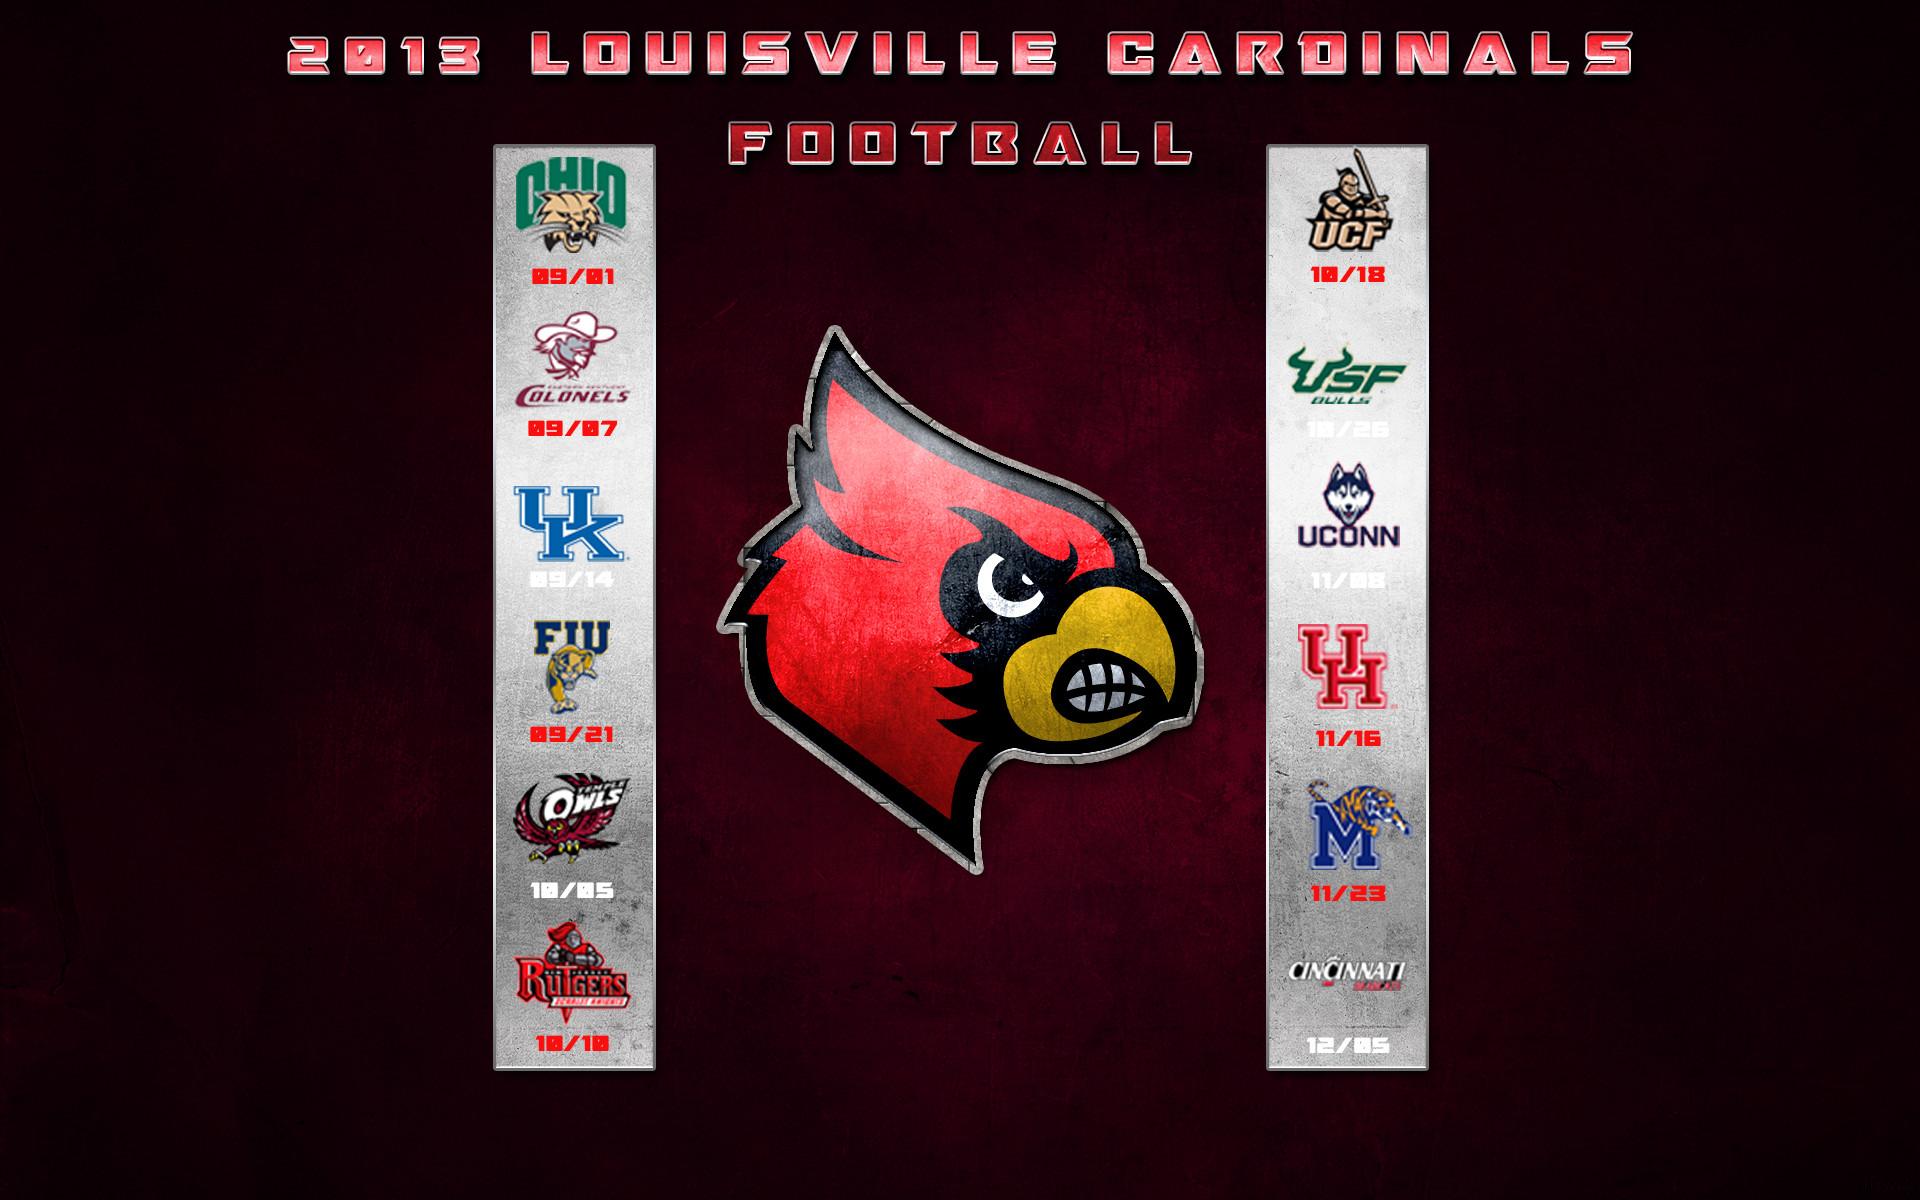 Louisville Cardinals Wallpaper Free 1200×900 Louisville Cardinals Wallpapers  (21 Wallpapers) | Adorable